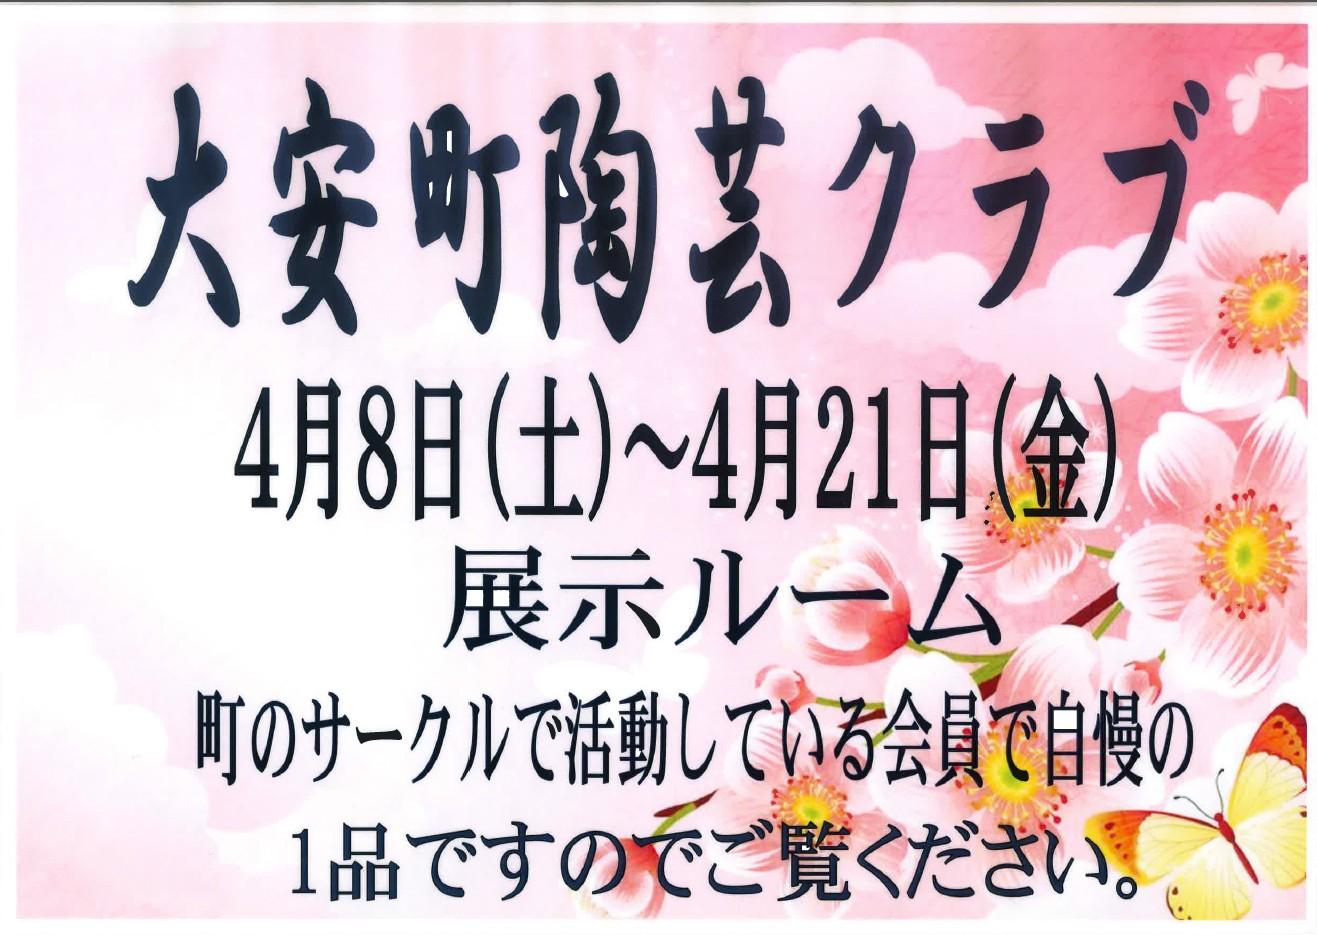 http://www.ajisainosato.com/info/images/2017y03m26d_180848994.jpg